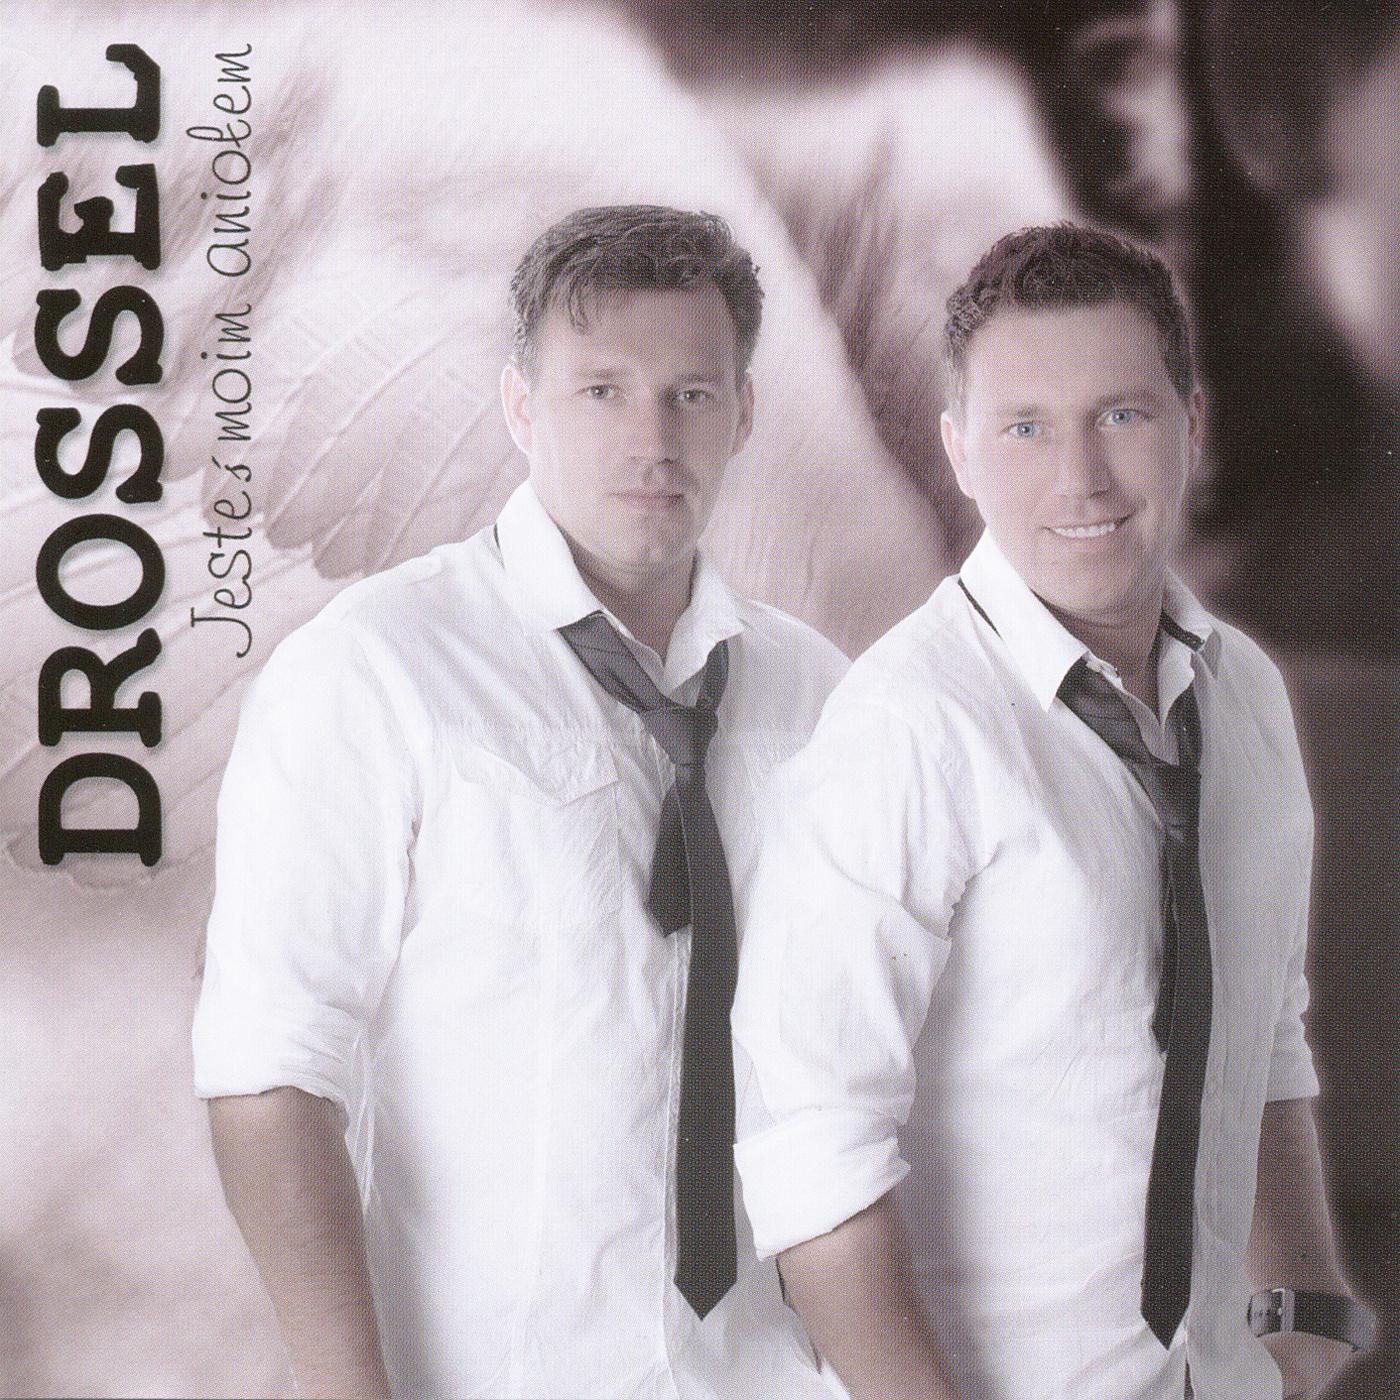 listen free to drossel, disco polo - sexi lala radio | iheartradio